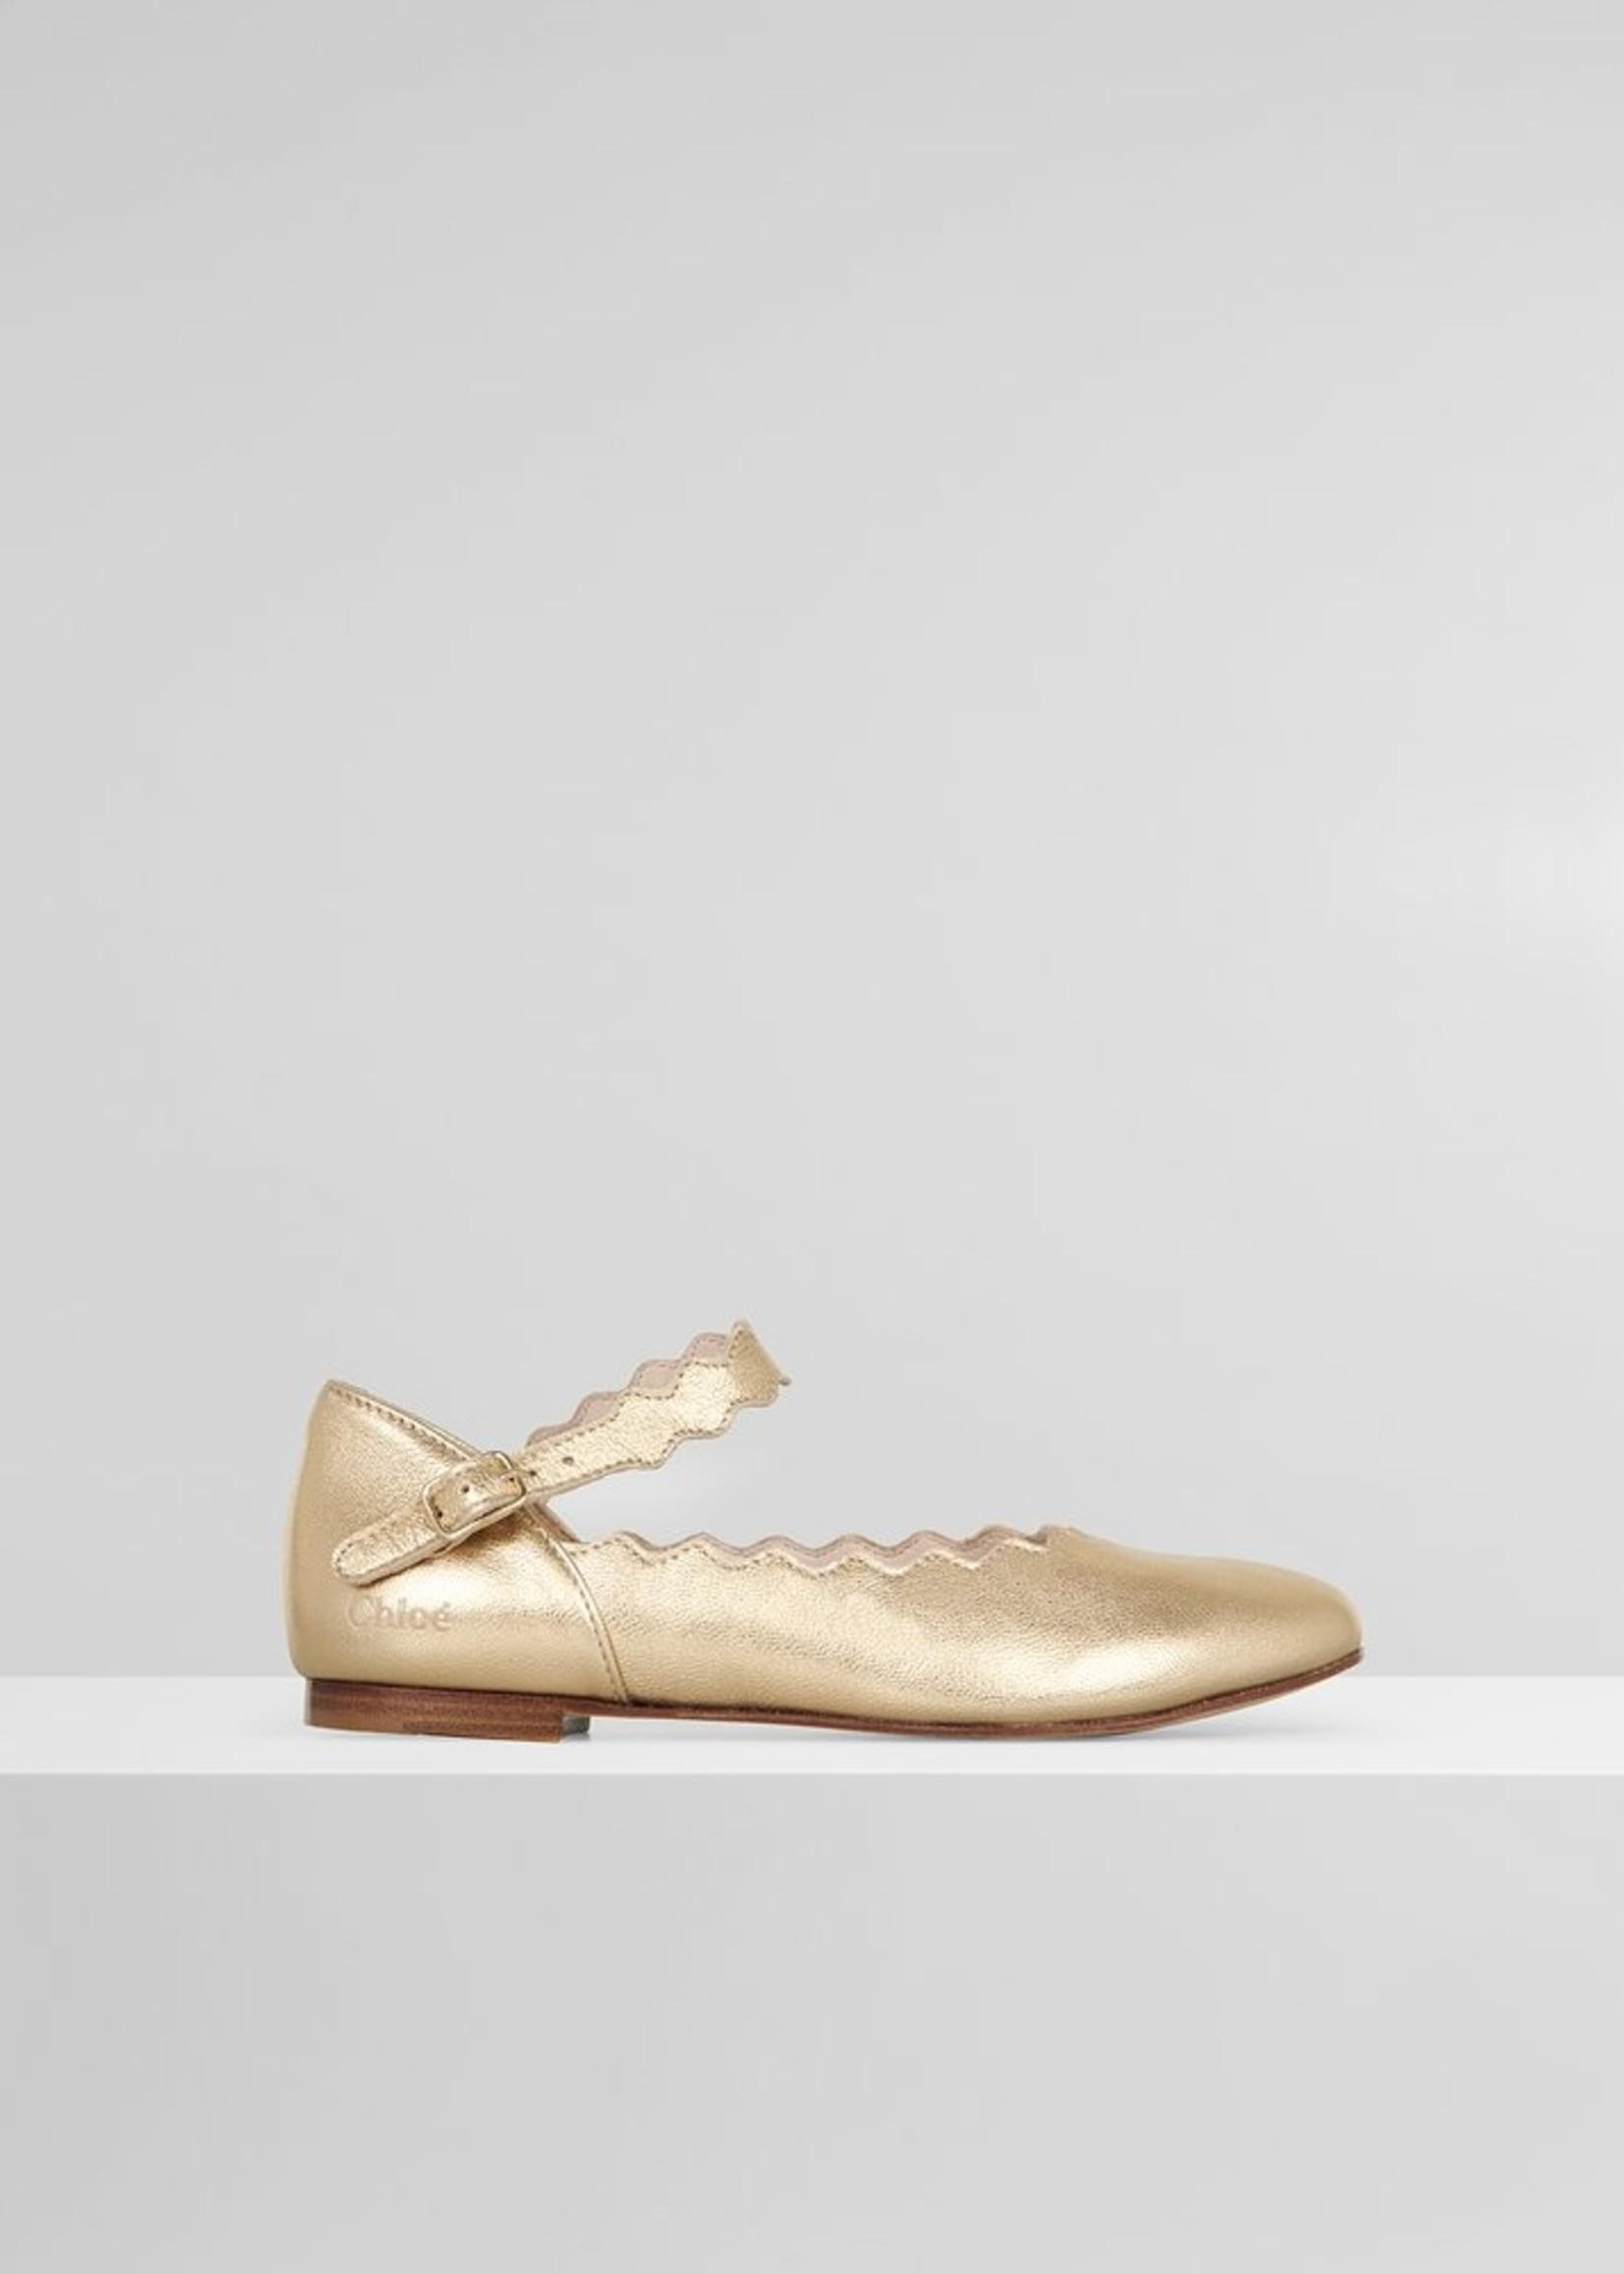 Chloe Chloe-ss21 Ballerina shoes 100% leather